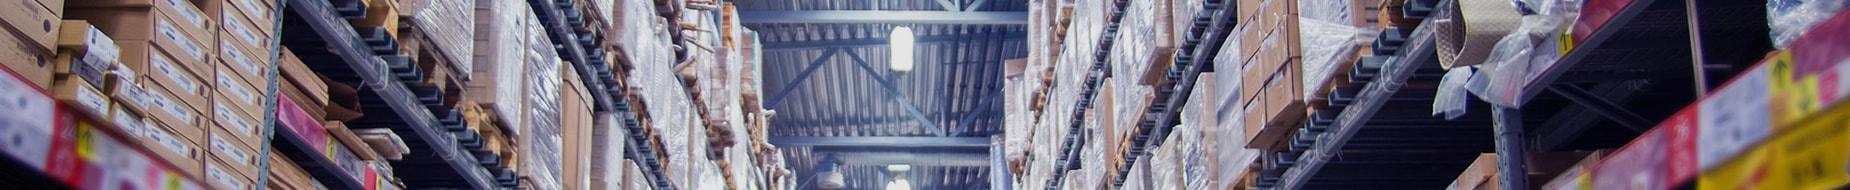 warehouse-